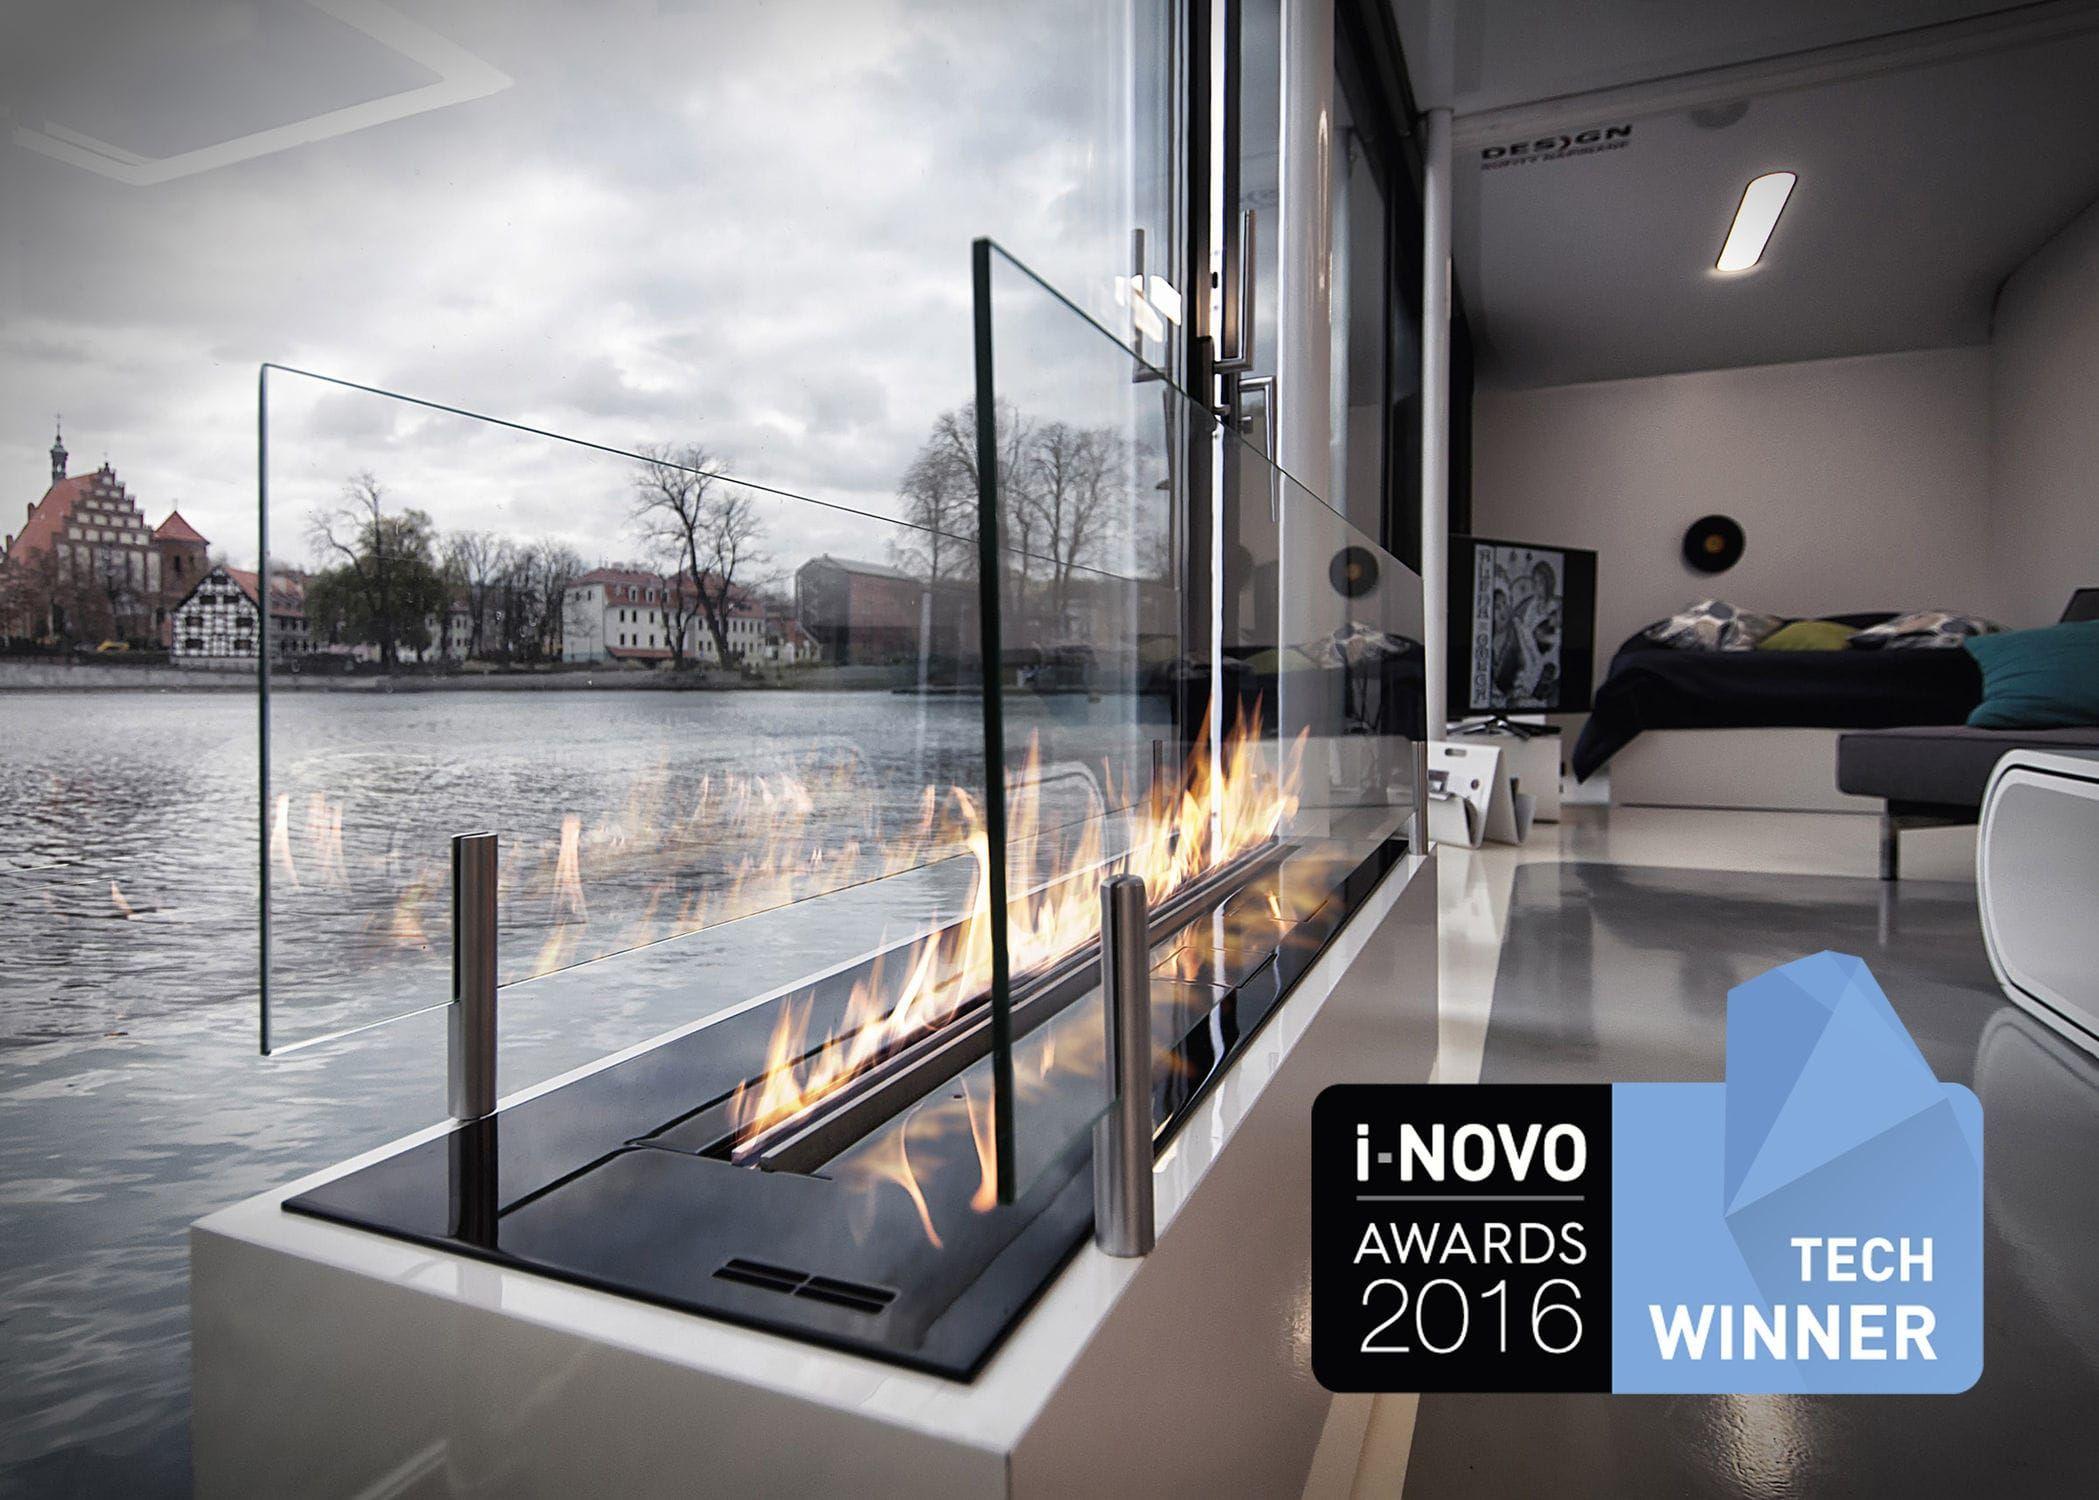 cd720d0821b2b7556368de0b89eeddf1 Top Result 50 Awesome Steel Outdoor Fireplace Gallery 2018 Hiw6